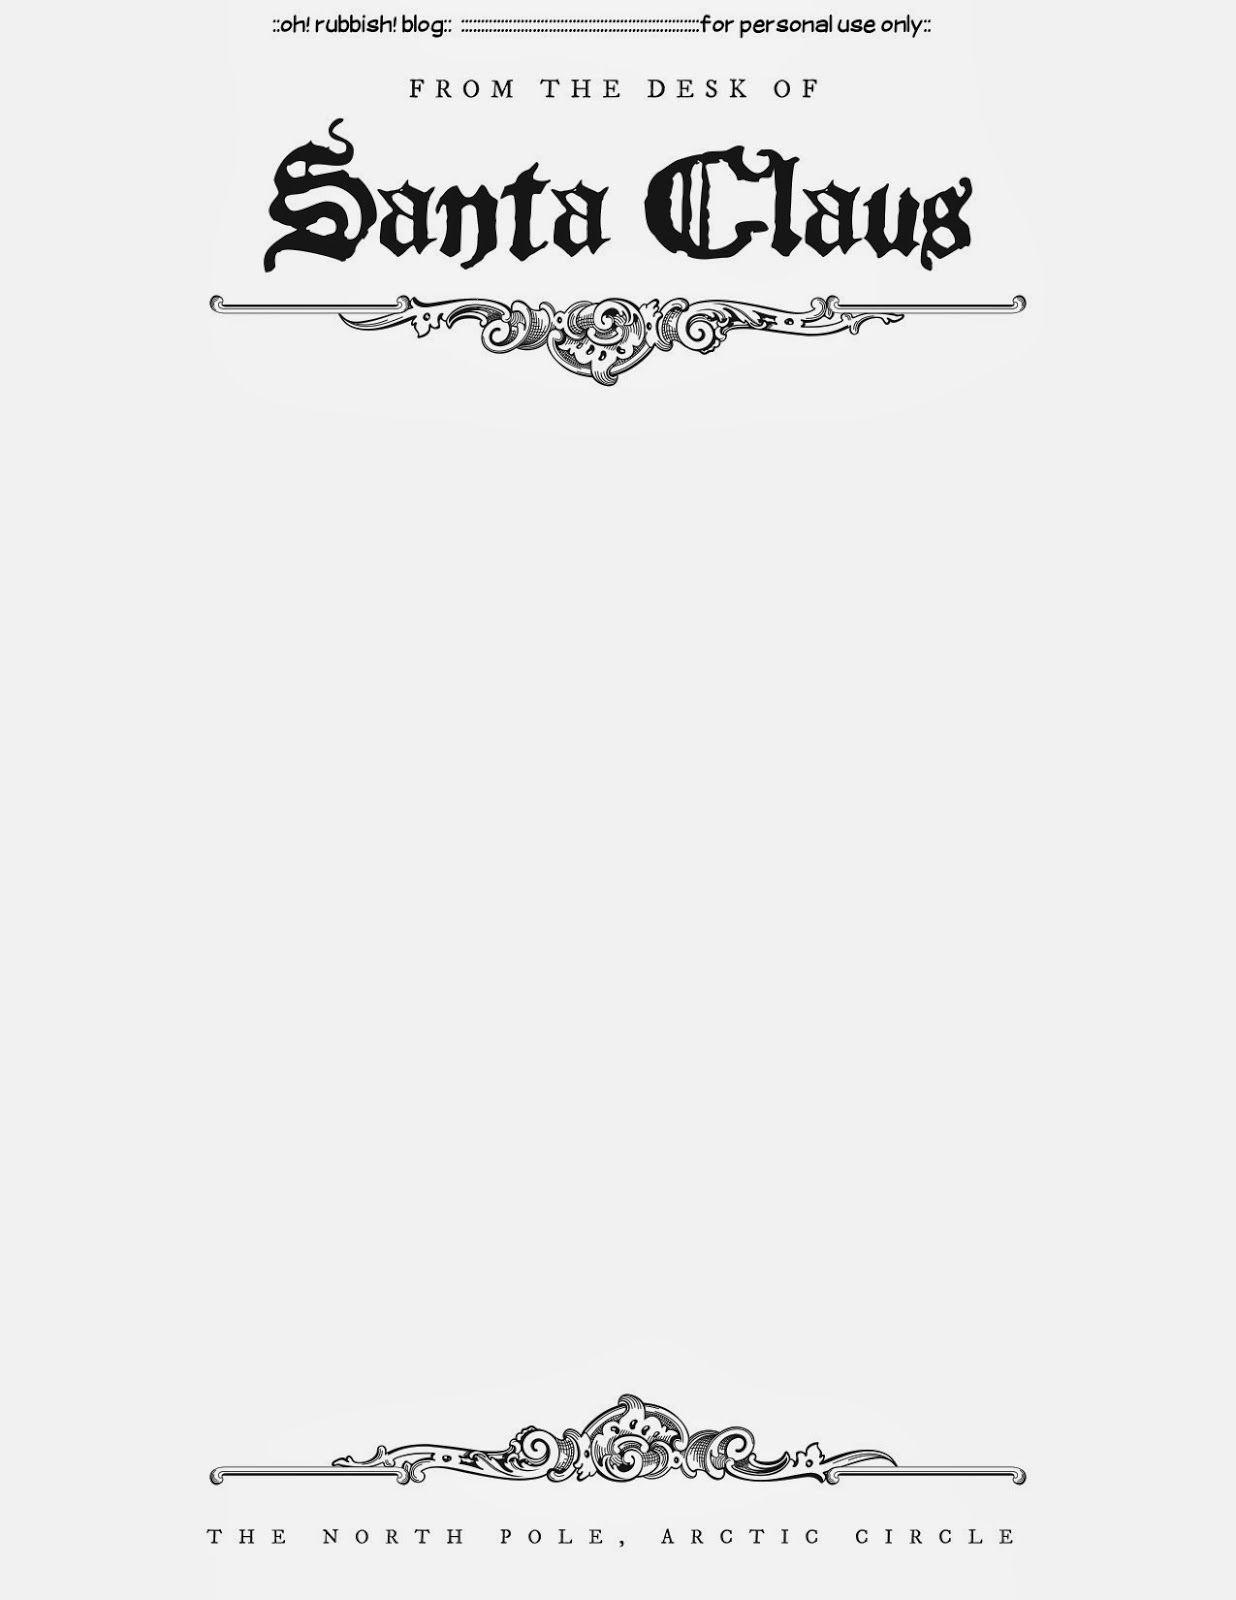 Santa Response Letter Template - Blank Letter From Santa Template Acurnamedia